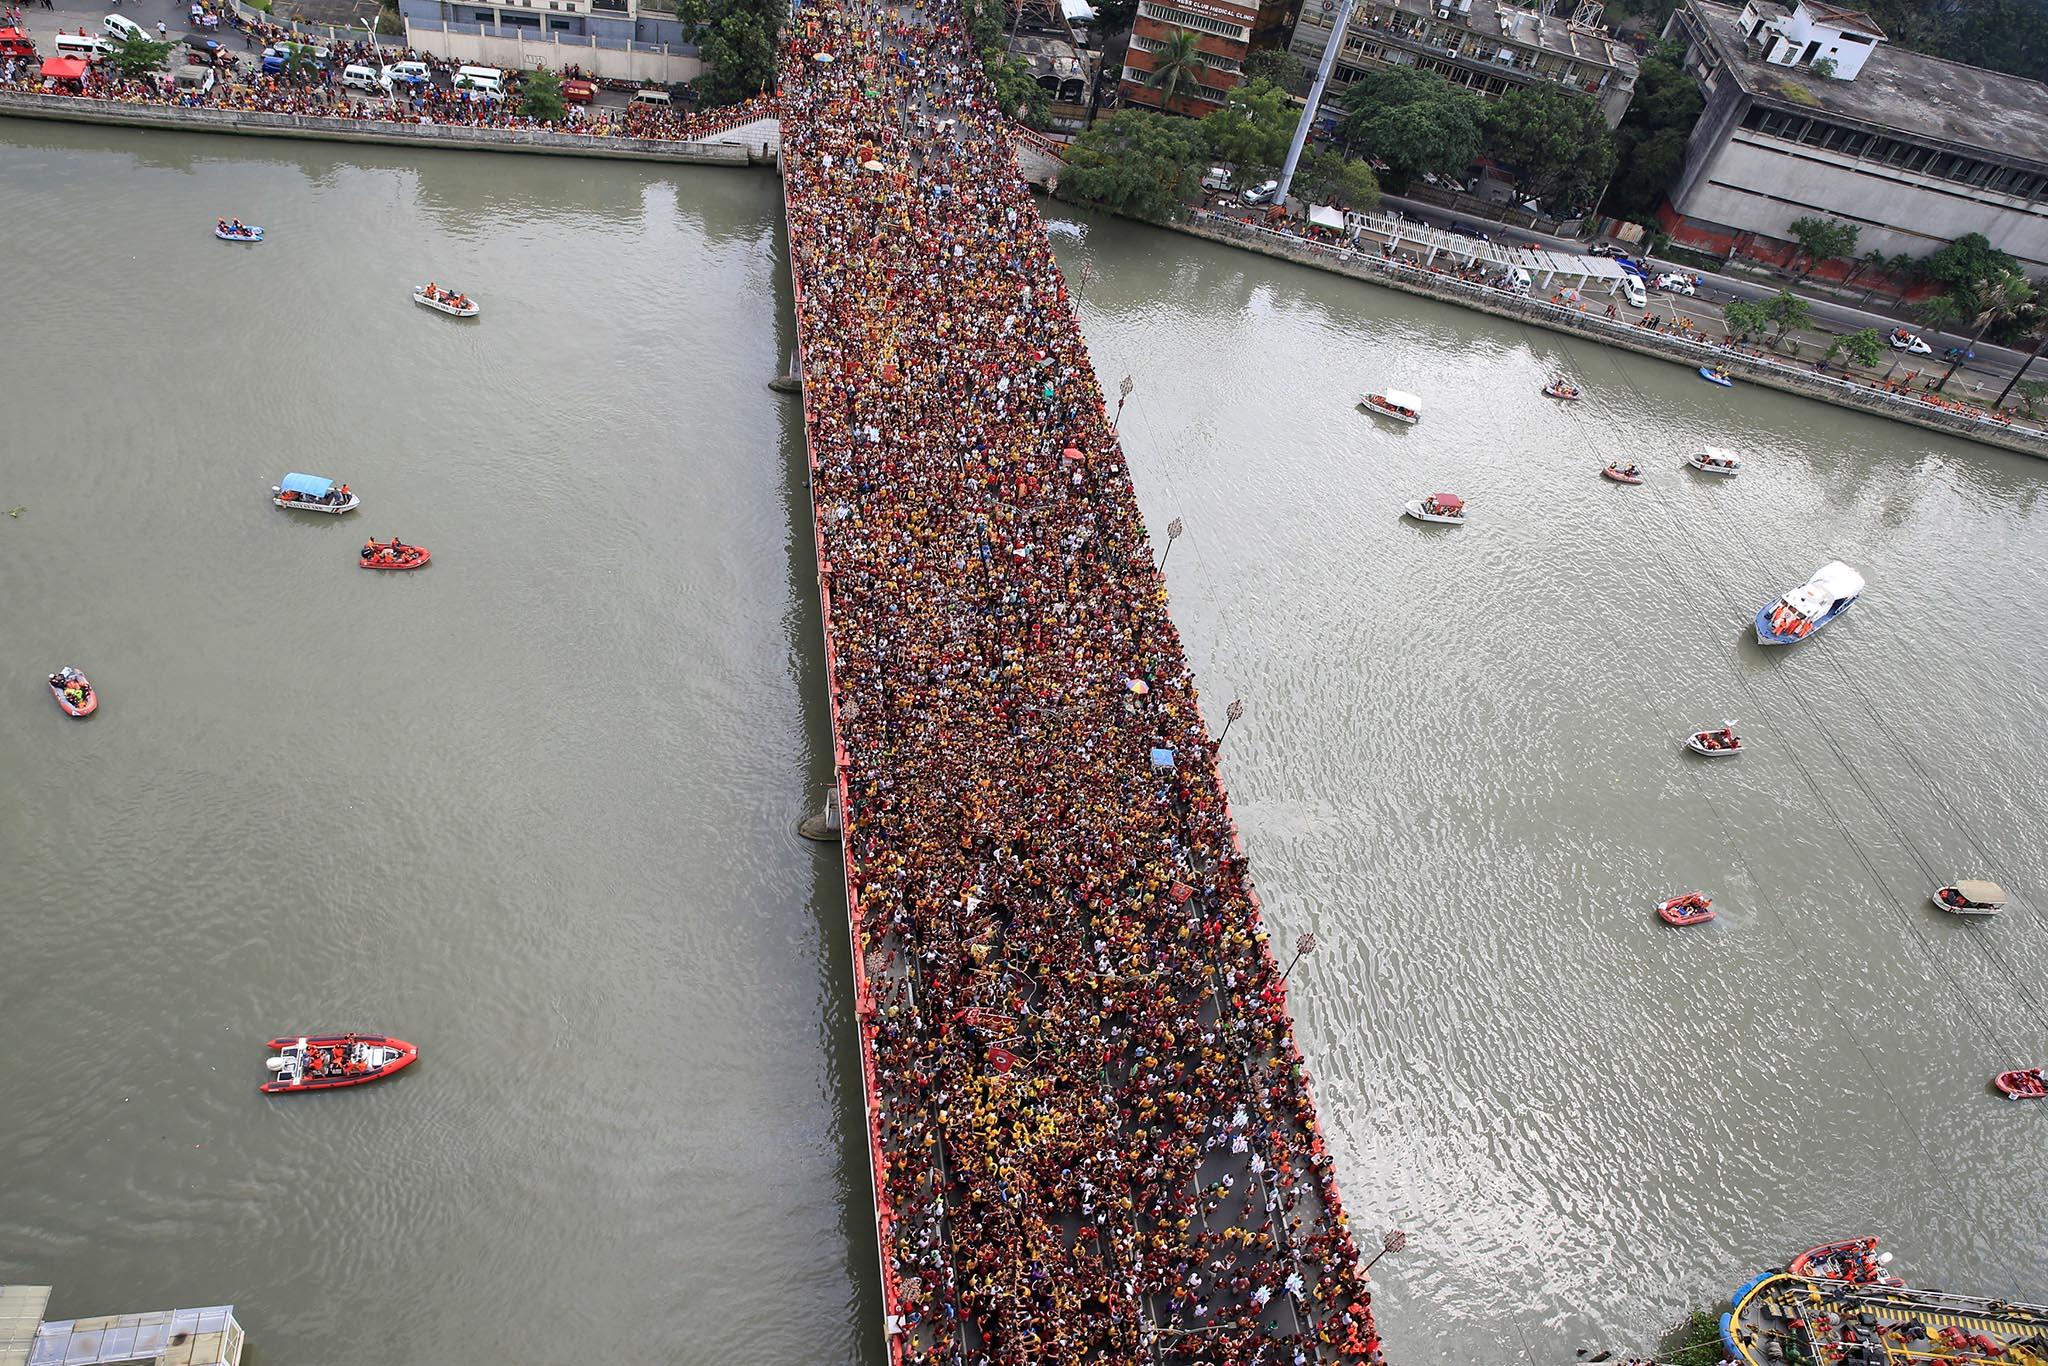 Devotees occupy Jones bridge as they take part in the annual procession of the Black Nazarene in metro Manila